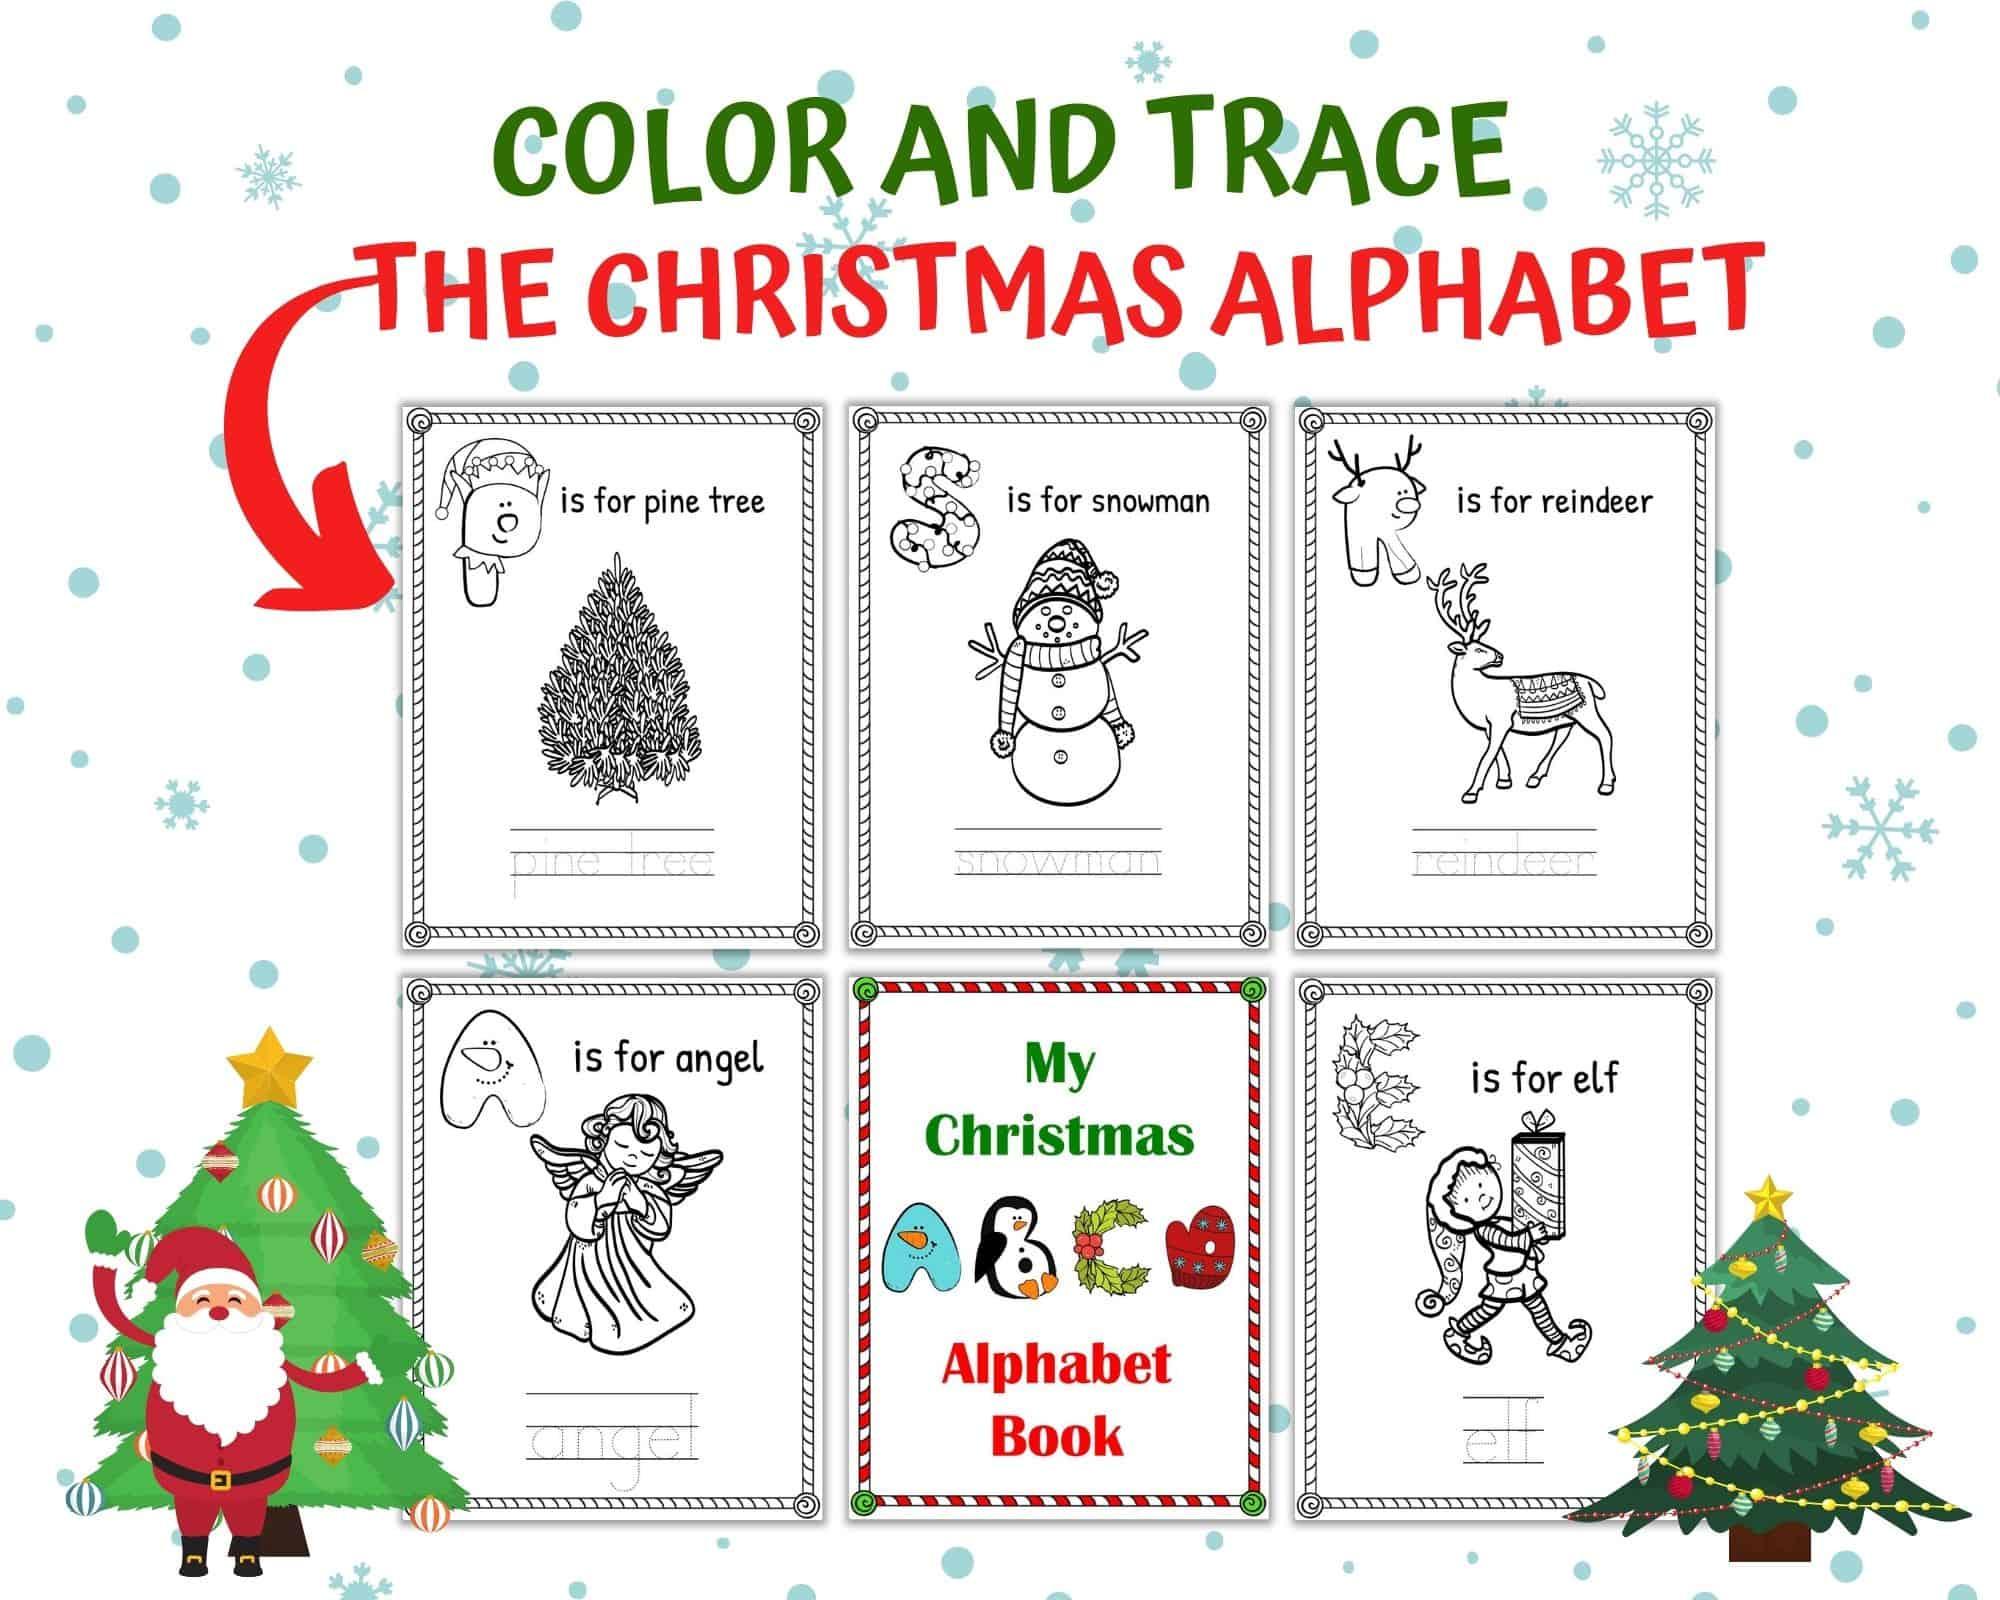 Free Christmas Alphabet Worksheets For Kindergarten   One